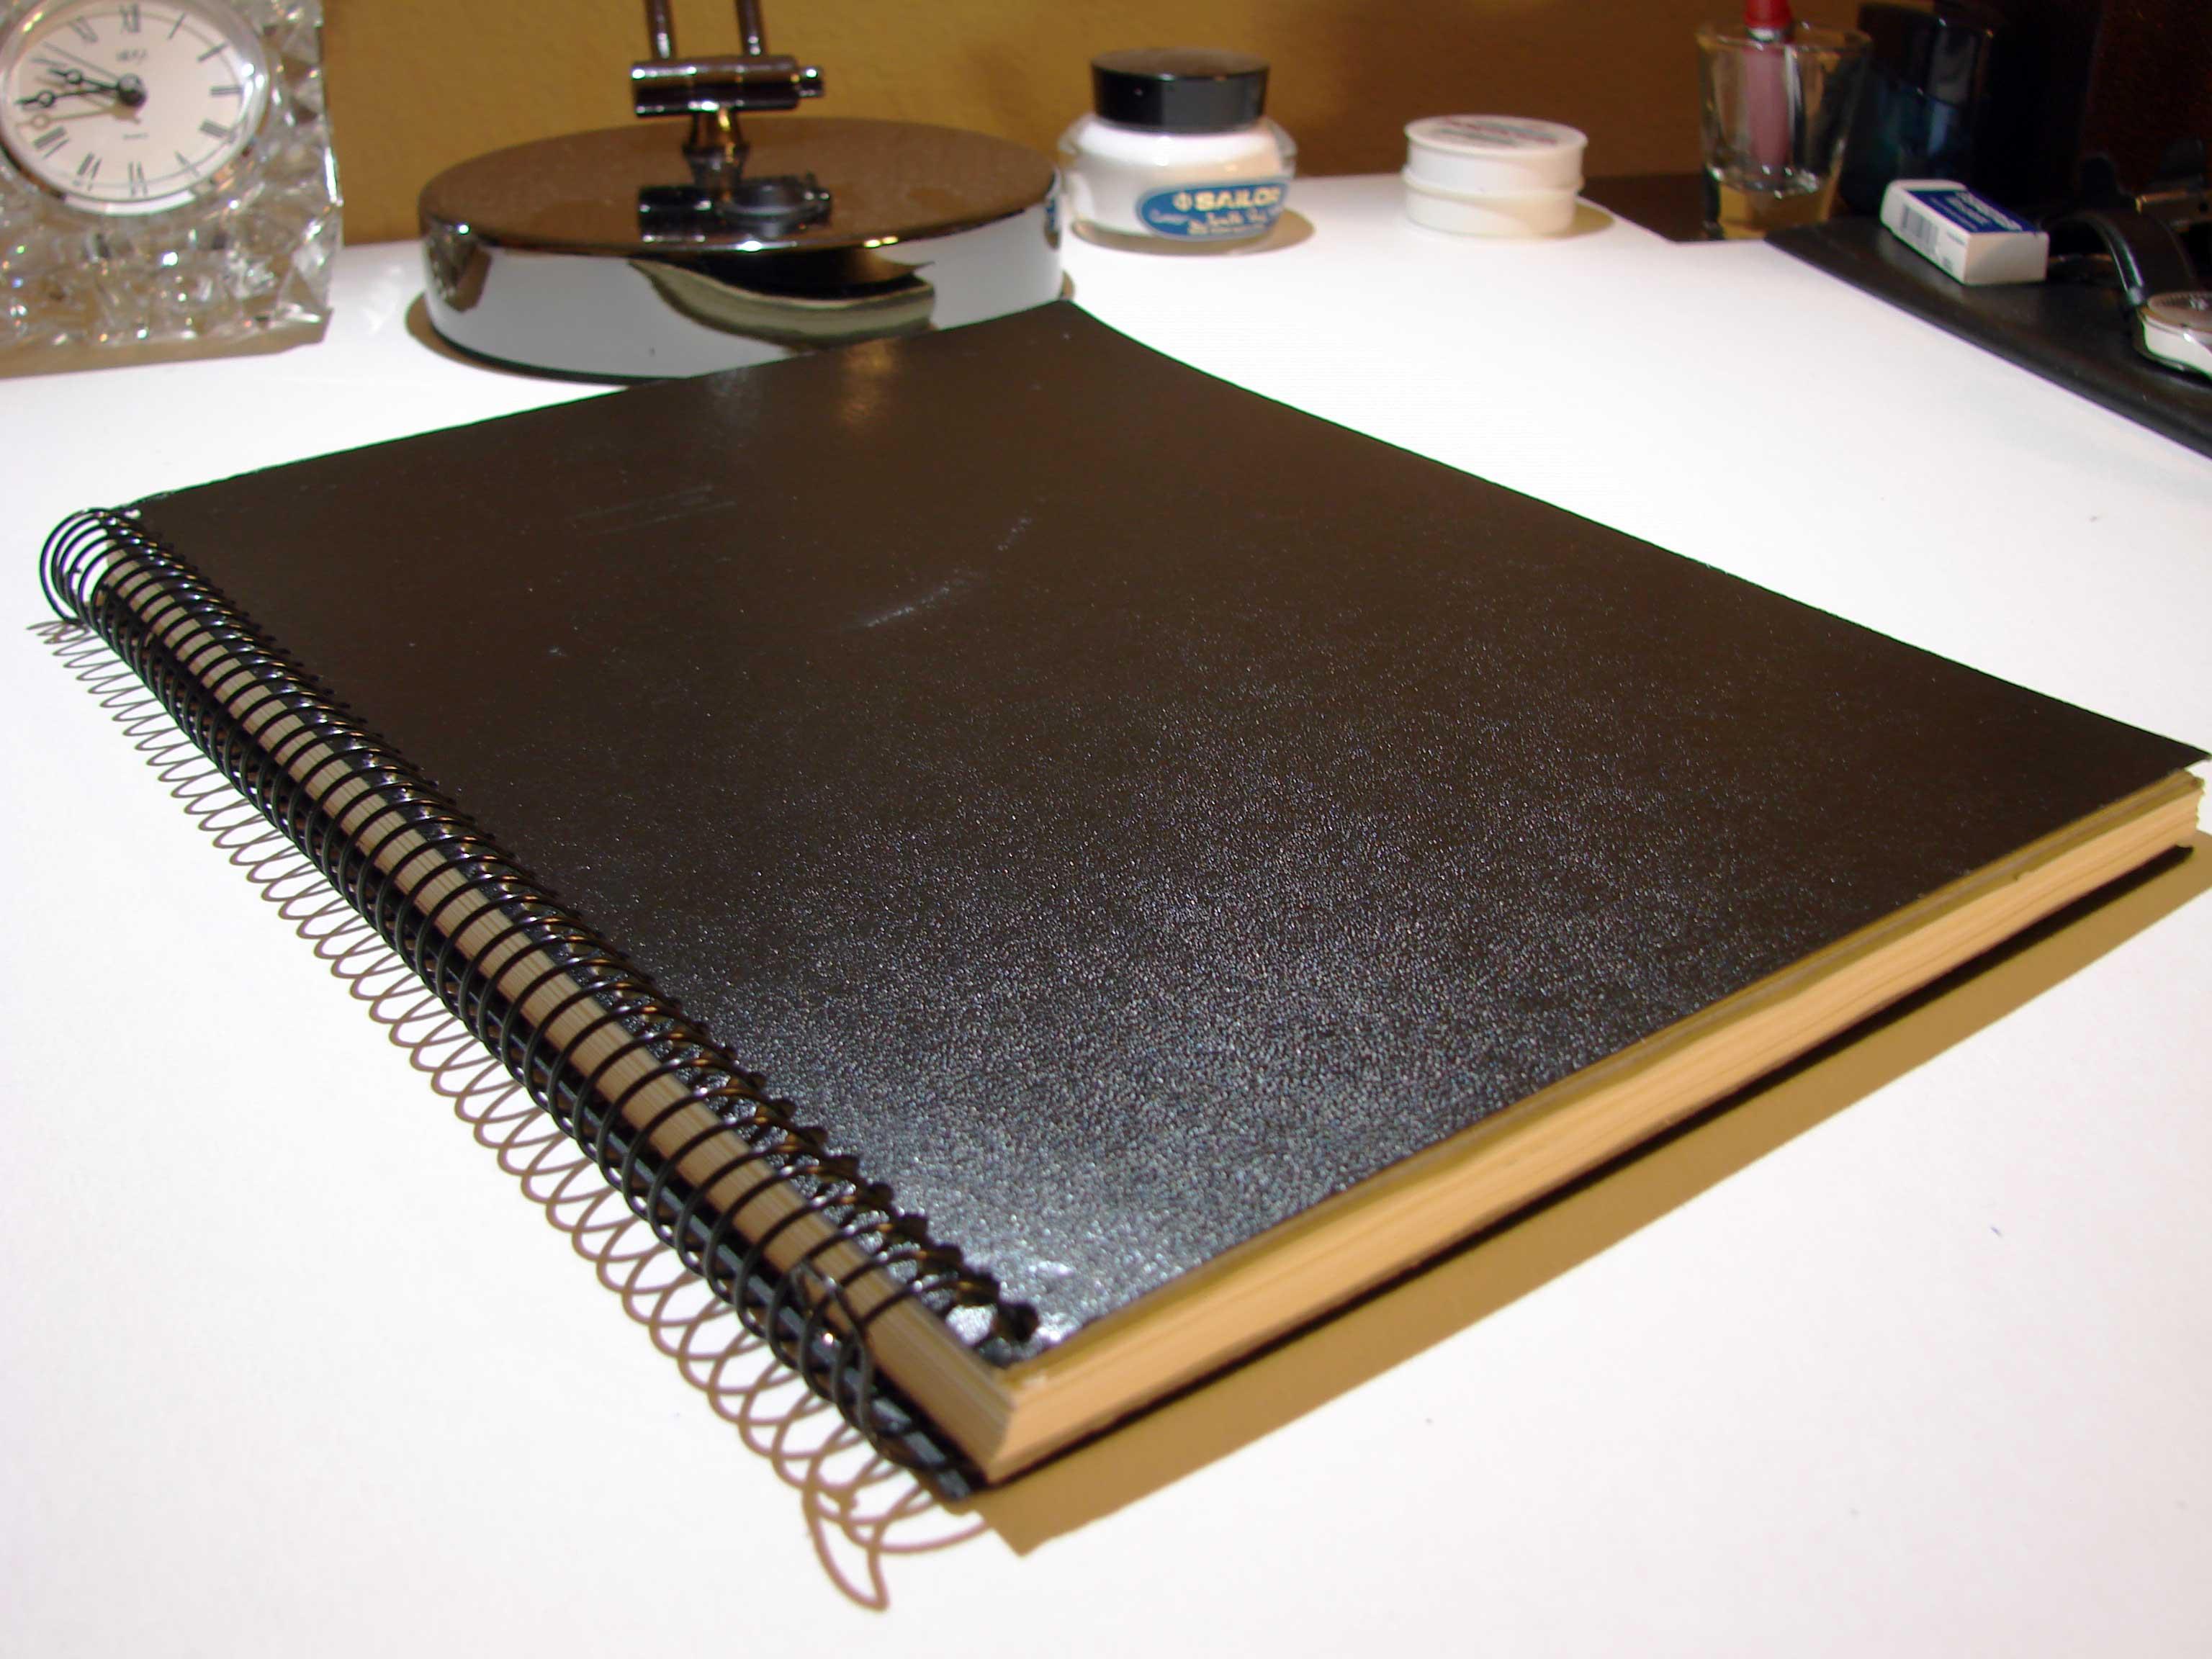 fpn_1399682538__tomoe_river_notebook_01.